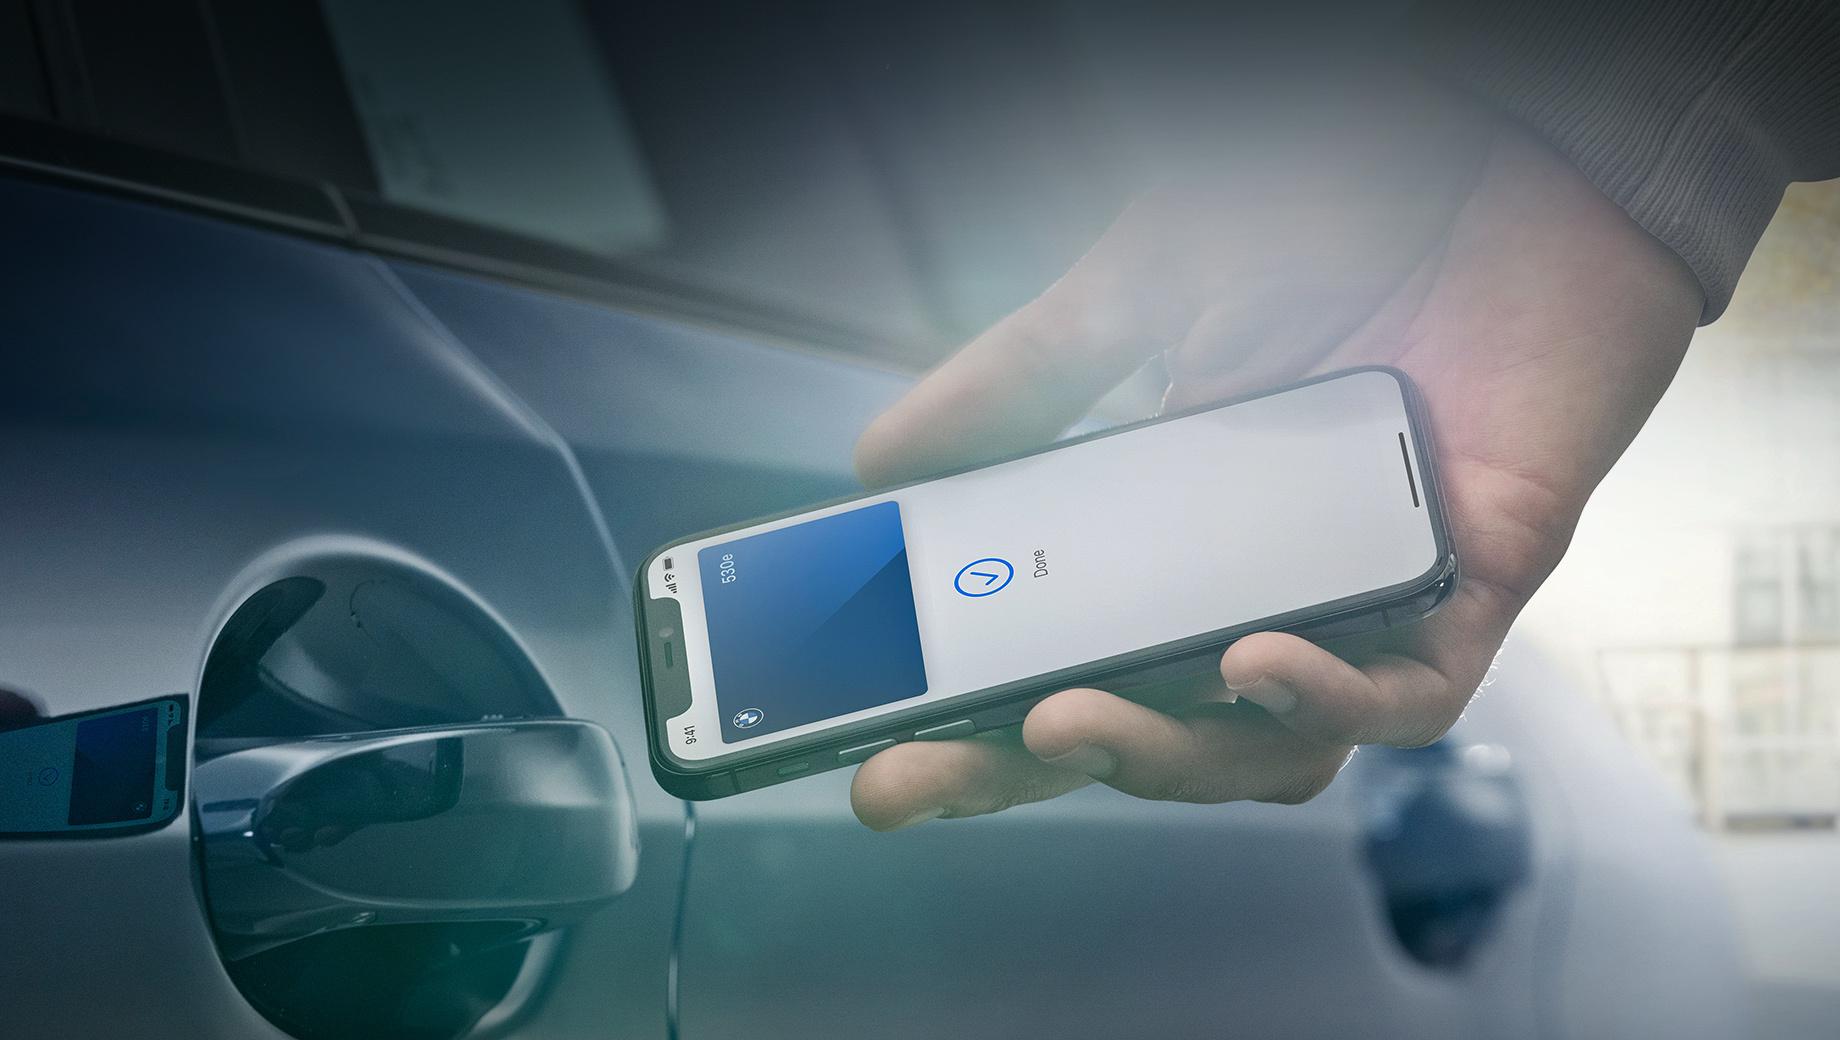 Смартфон iPhone станет цифровым ключом для моделей BMW